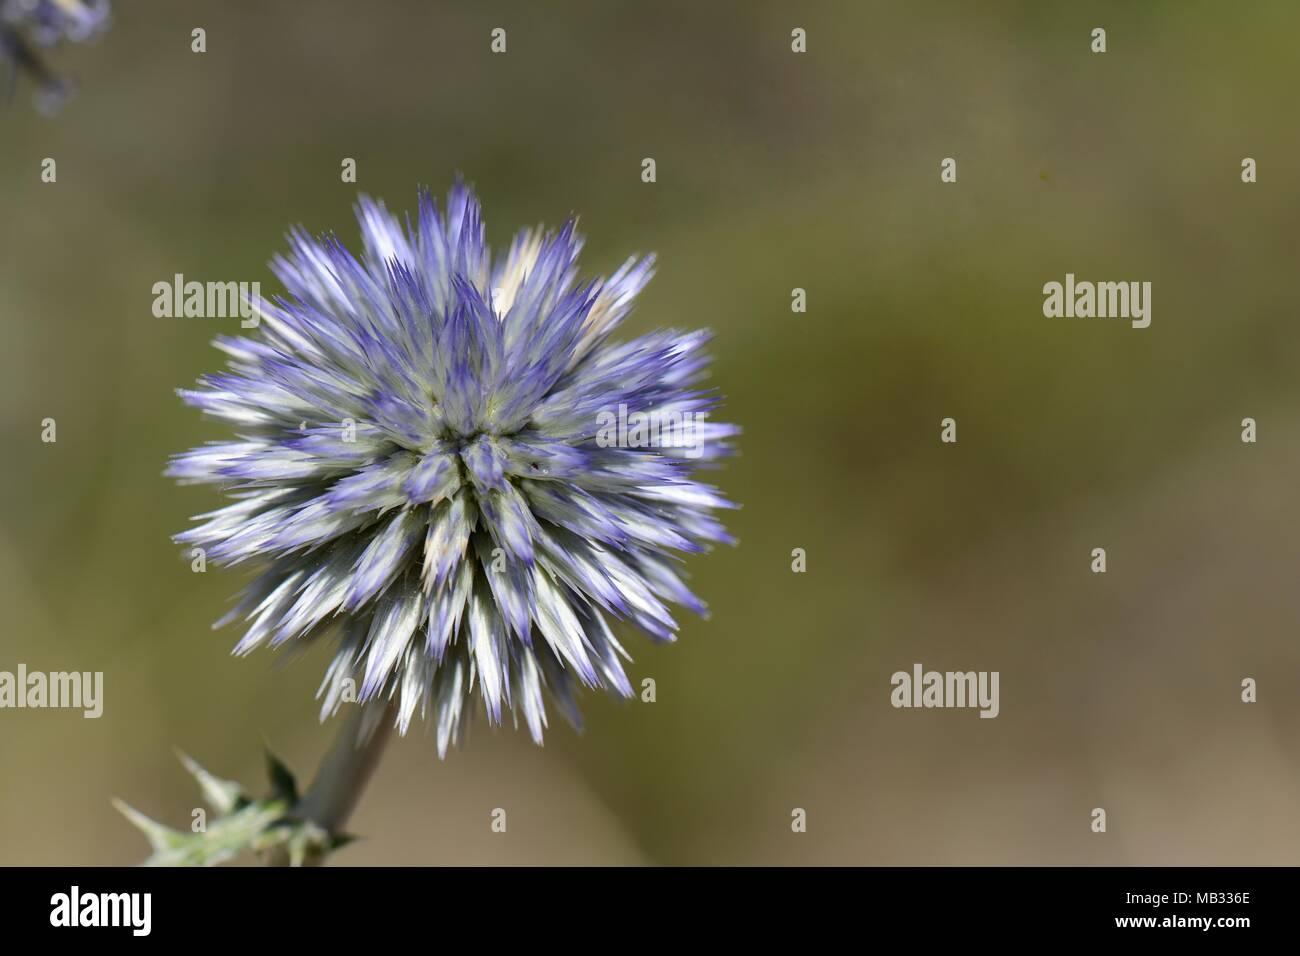 Spiny globe thistle (Echinops spinosissimus) in limestone mountains, near Kosmas, Arcadia, Peloponnese, Greece, August. - Stock Image